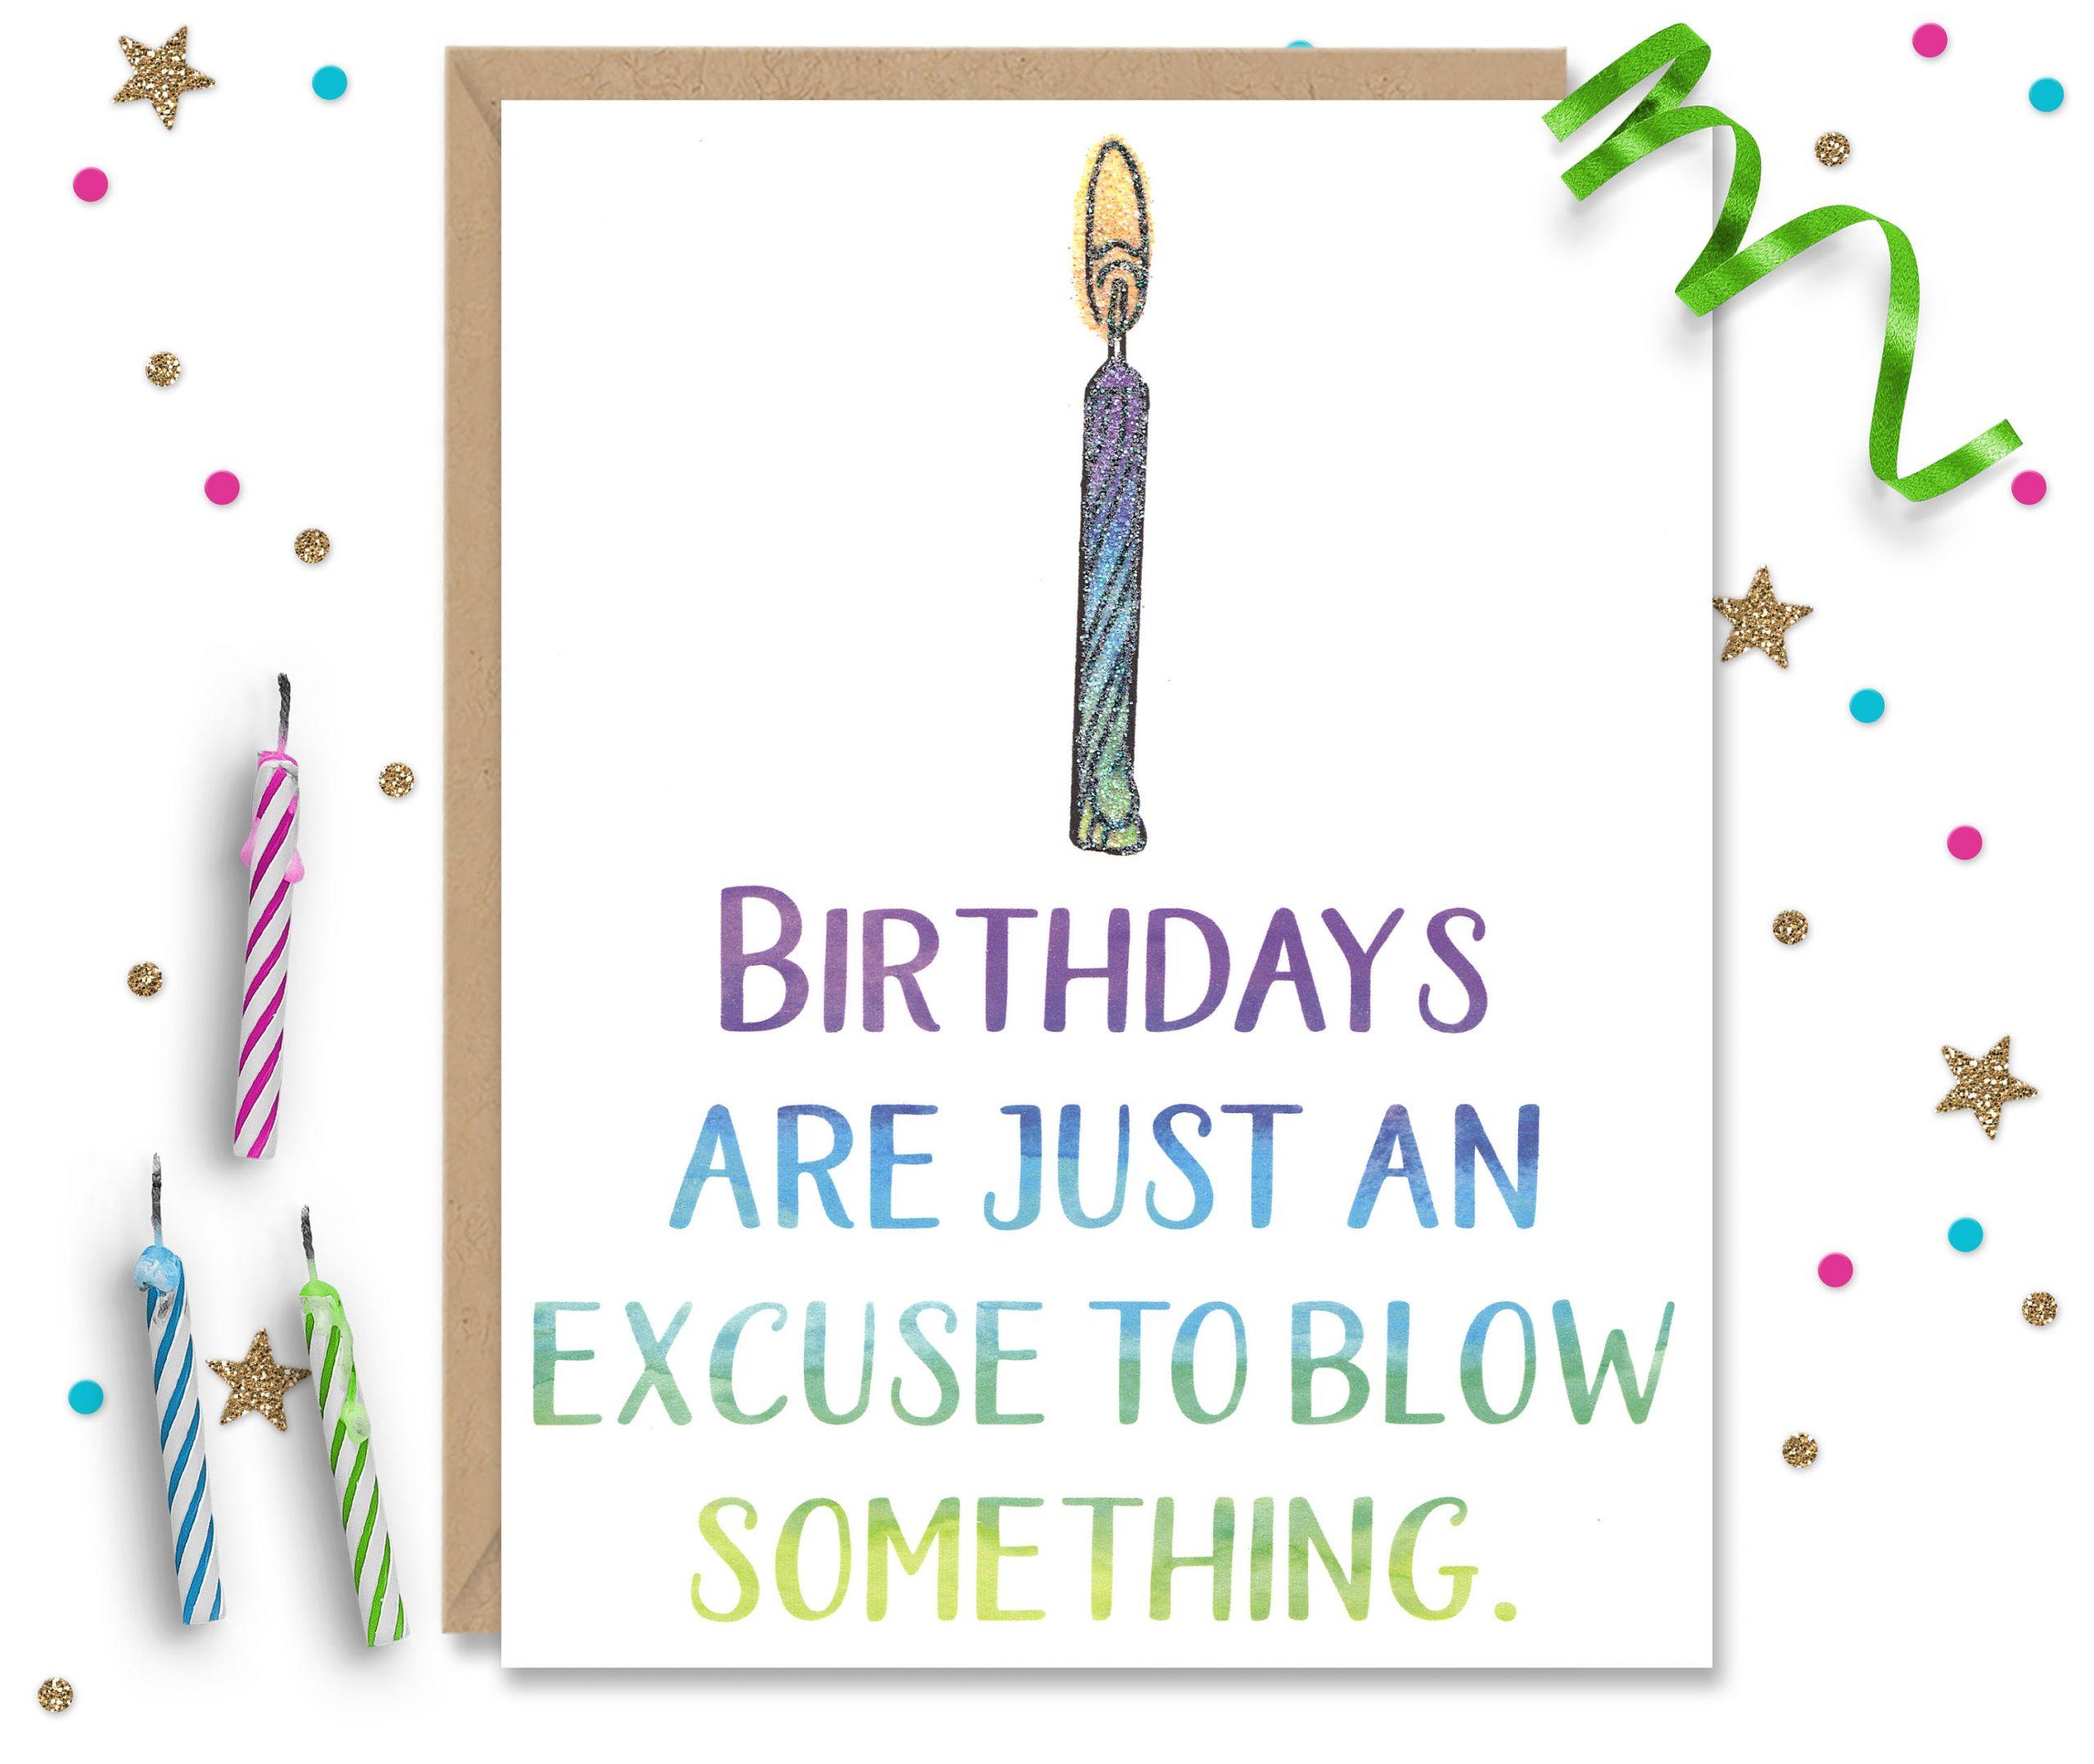 Funny Sexy Birthday Cards  Funny Birthday Card y Birthday Naughty Card Card for